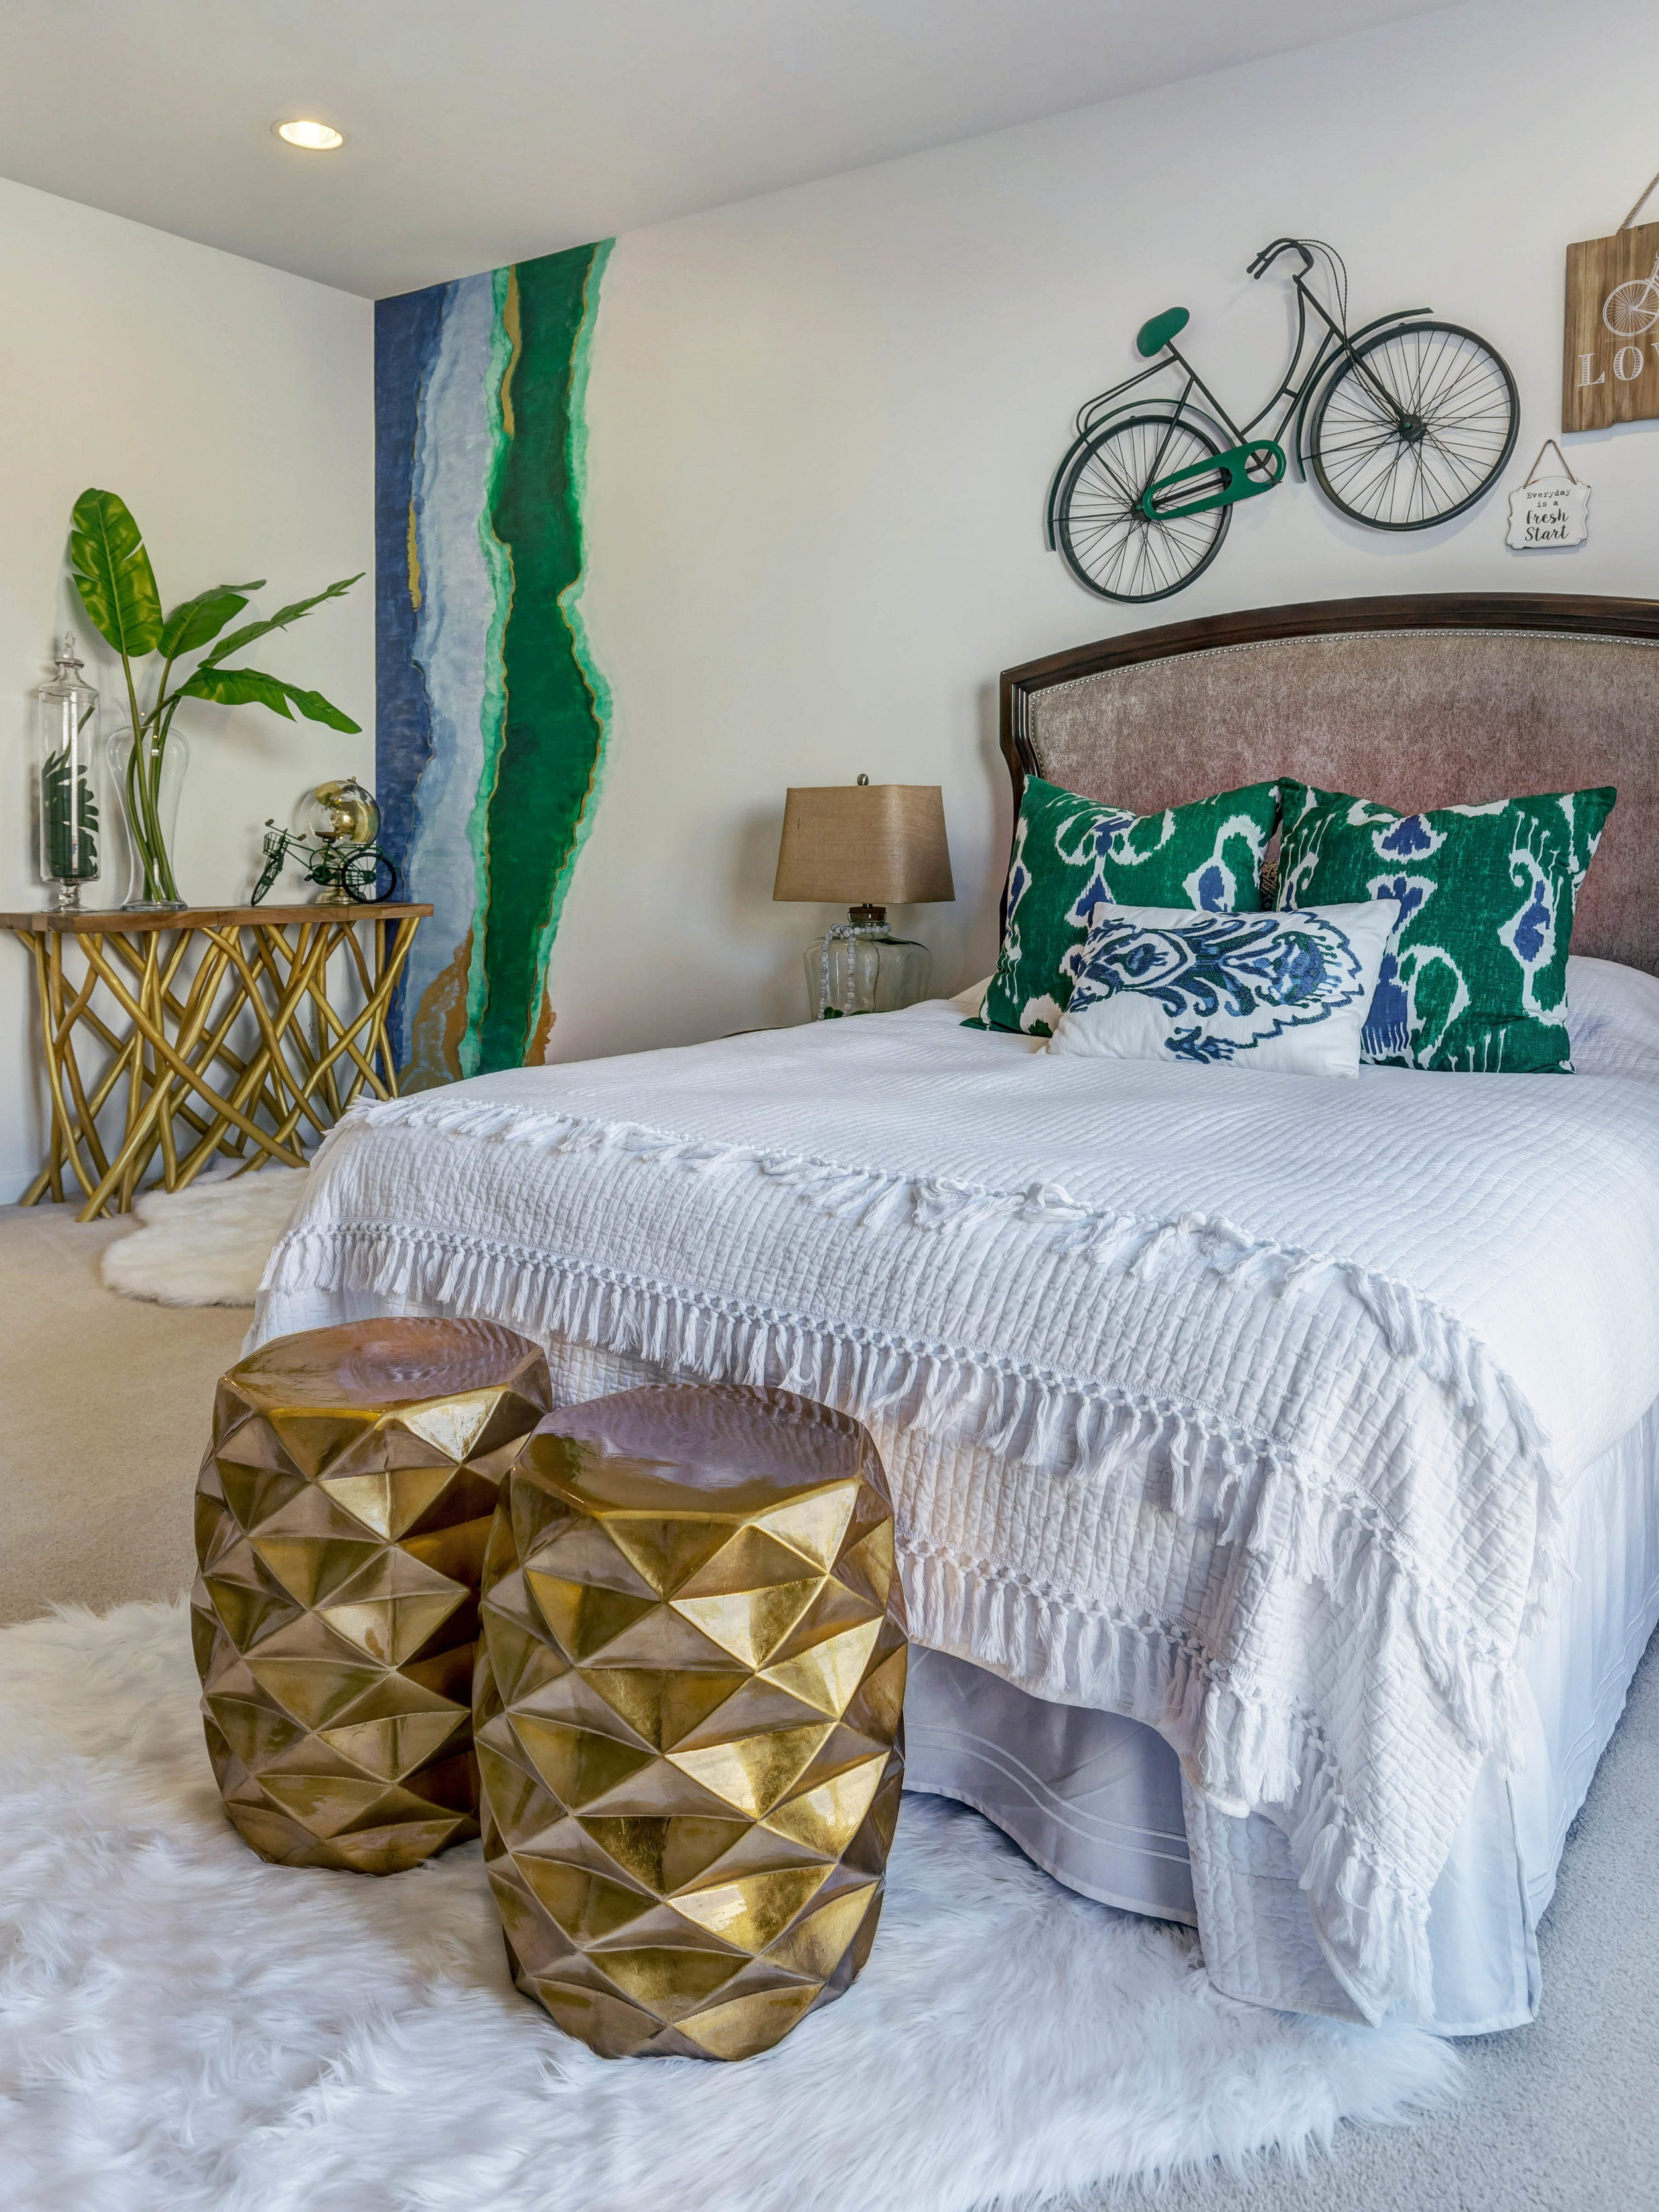 'Enjoy Your Journey' Theme Bedroom Design